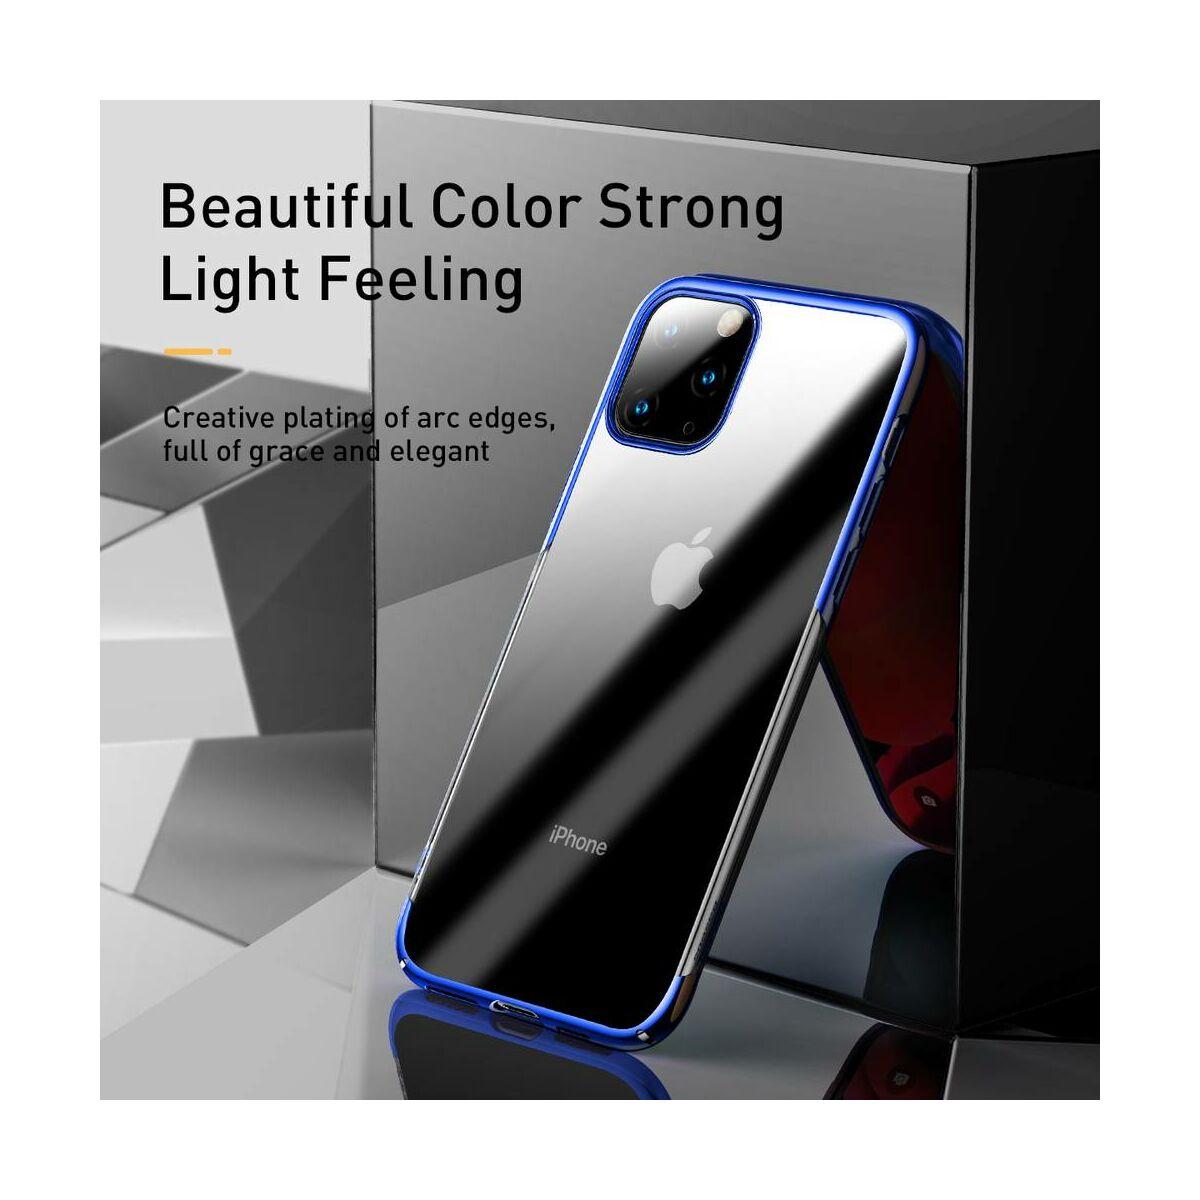 Baseus iPhone 11 Pro Max tok, Glitter, kék (WIAPIPH65S-DW03)